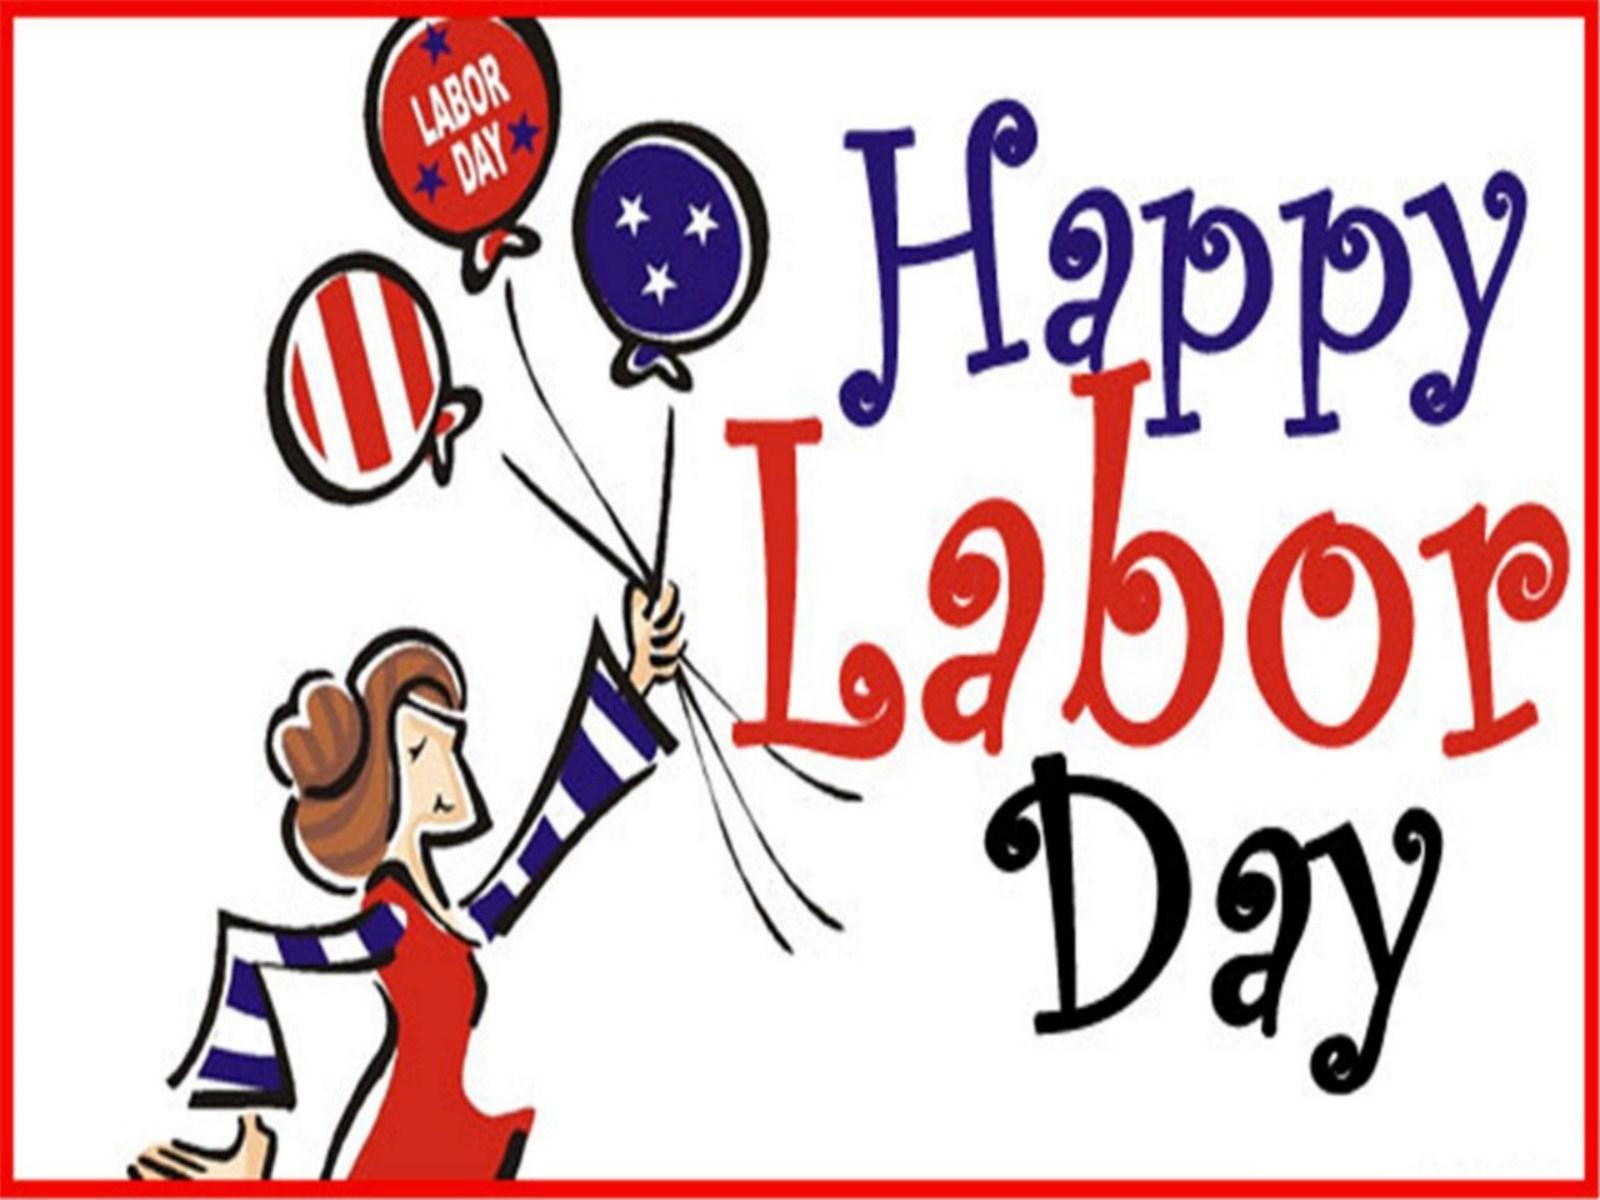 Labor Day Computer Wallpaper